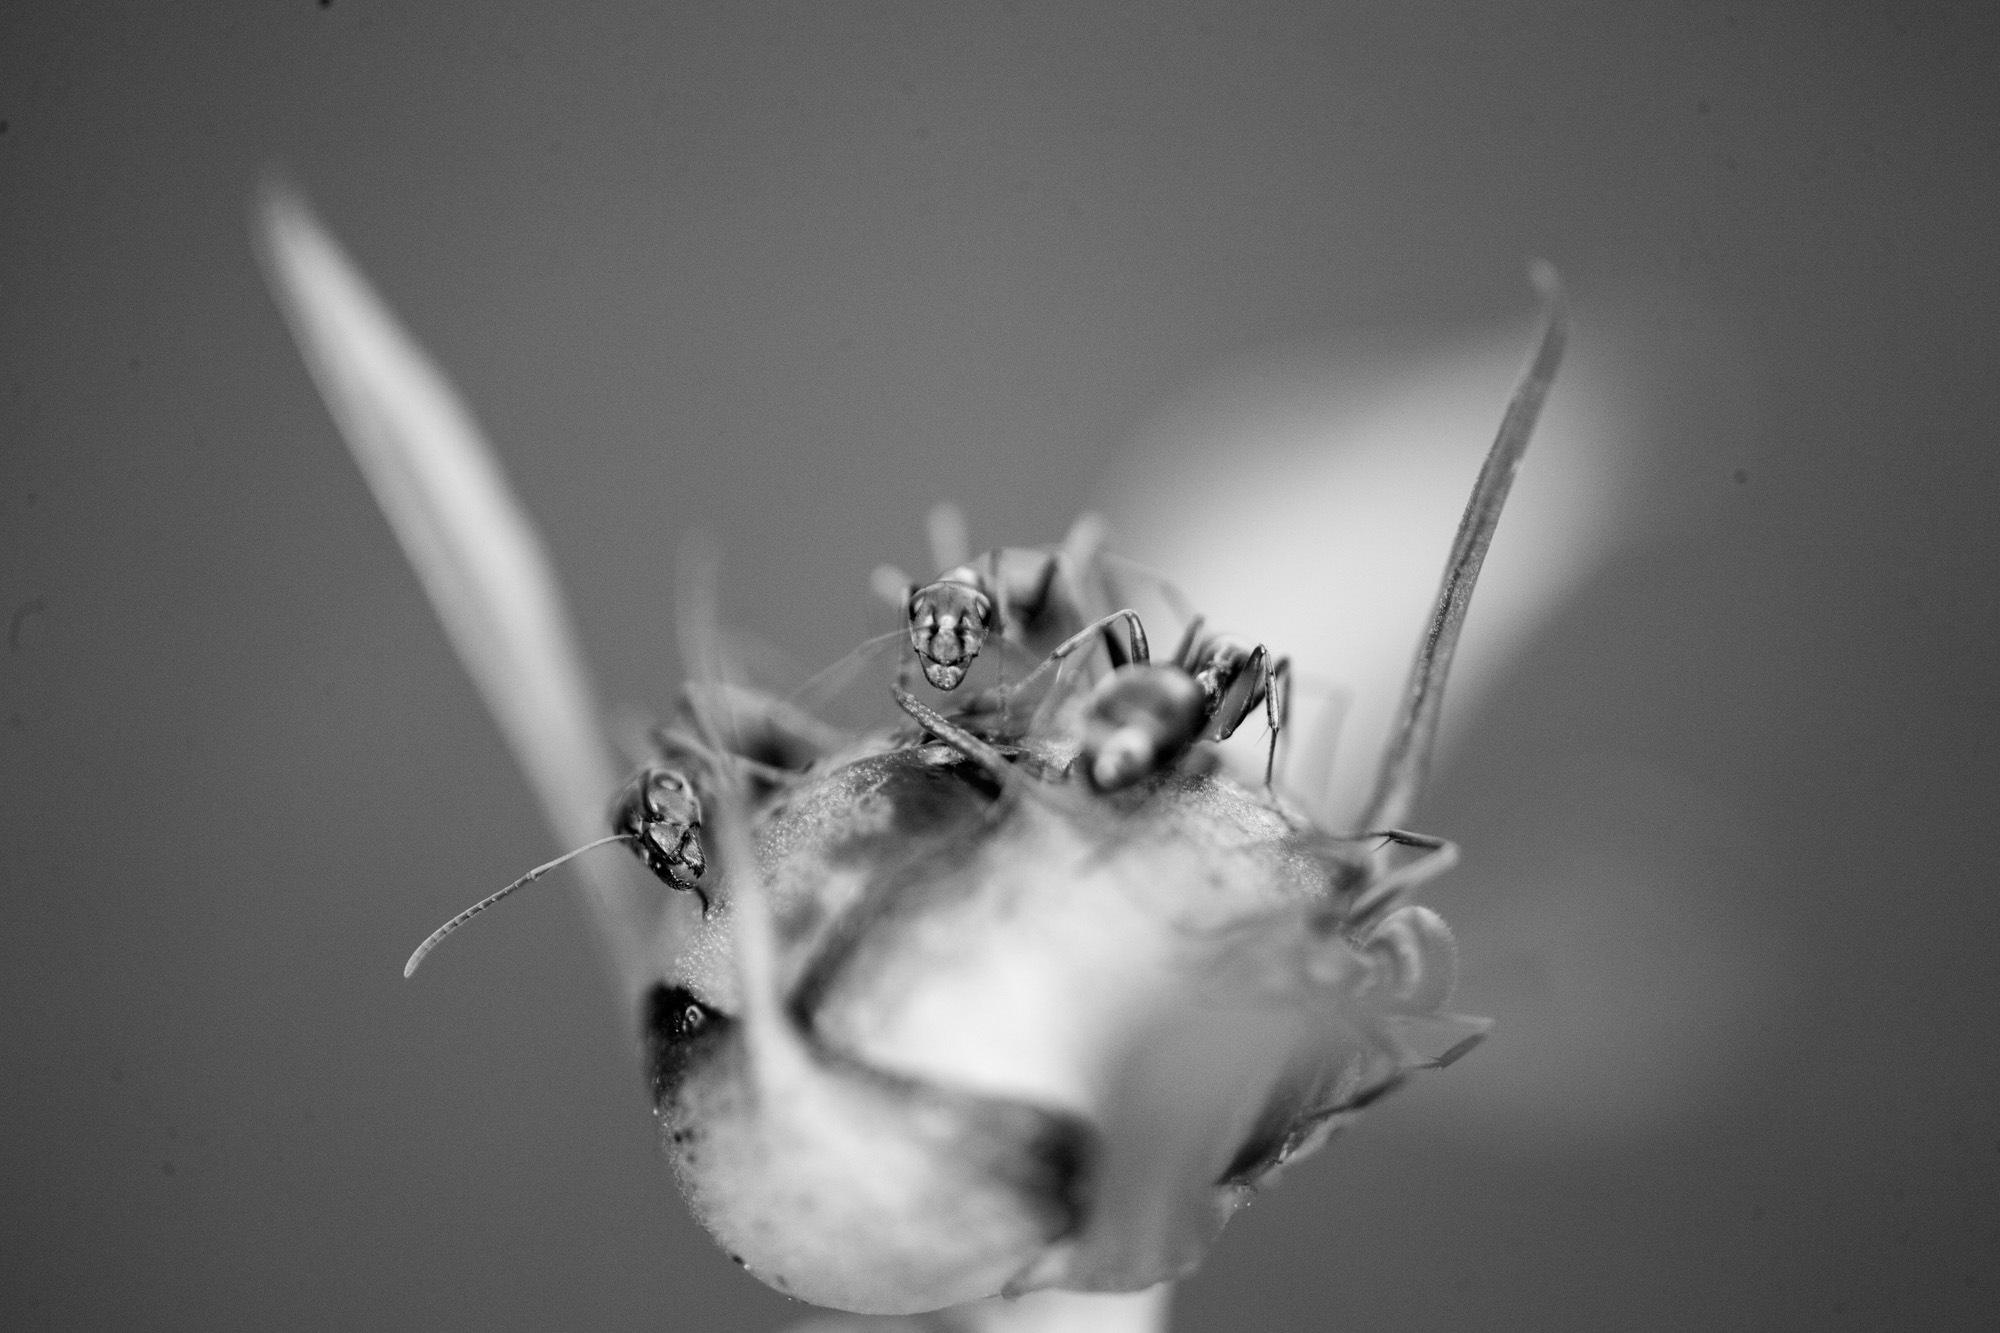 Peony bulb by Lawrence Splitter